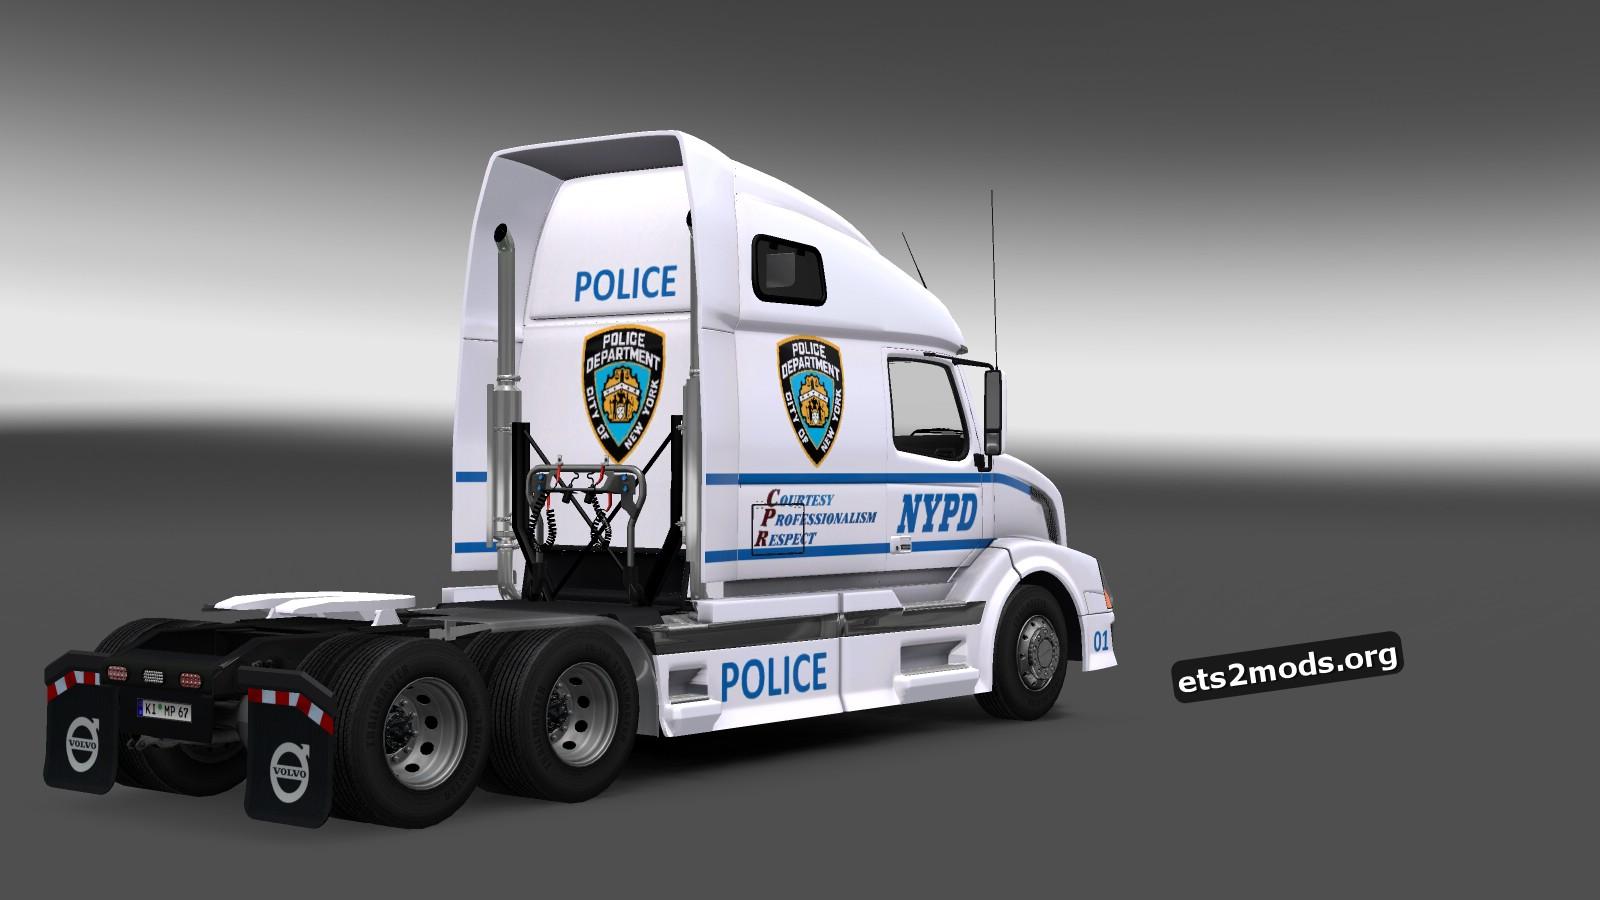 N.Y.P.D Skin for Volvo VNL 670